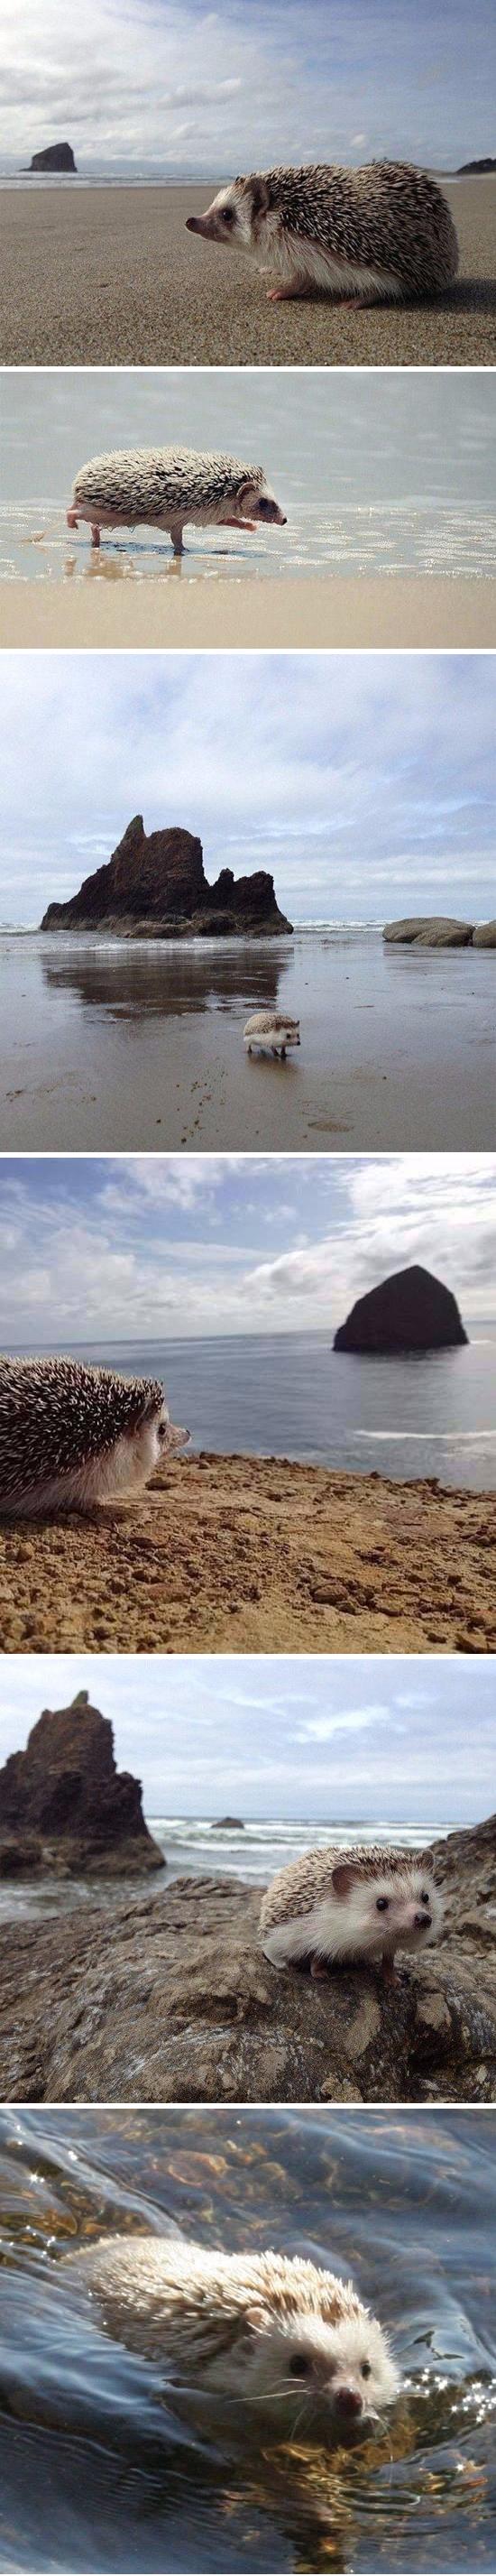 Hedgehogs trip to the beach http://ift.tt/2rqWd0h